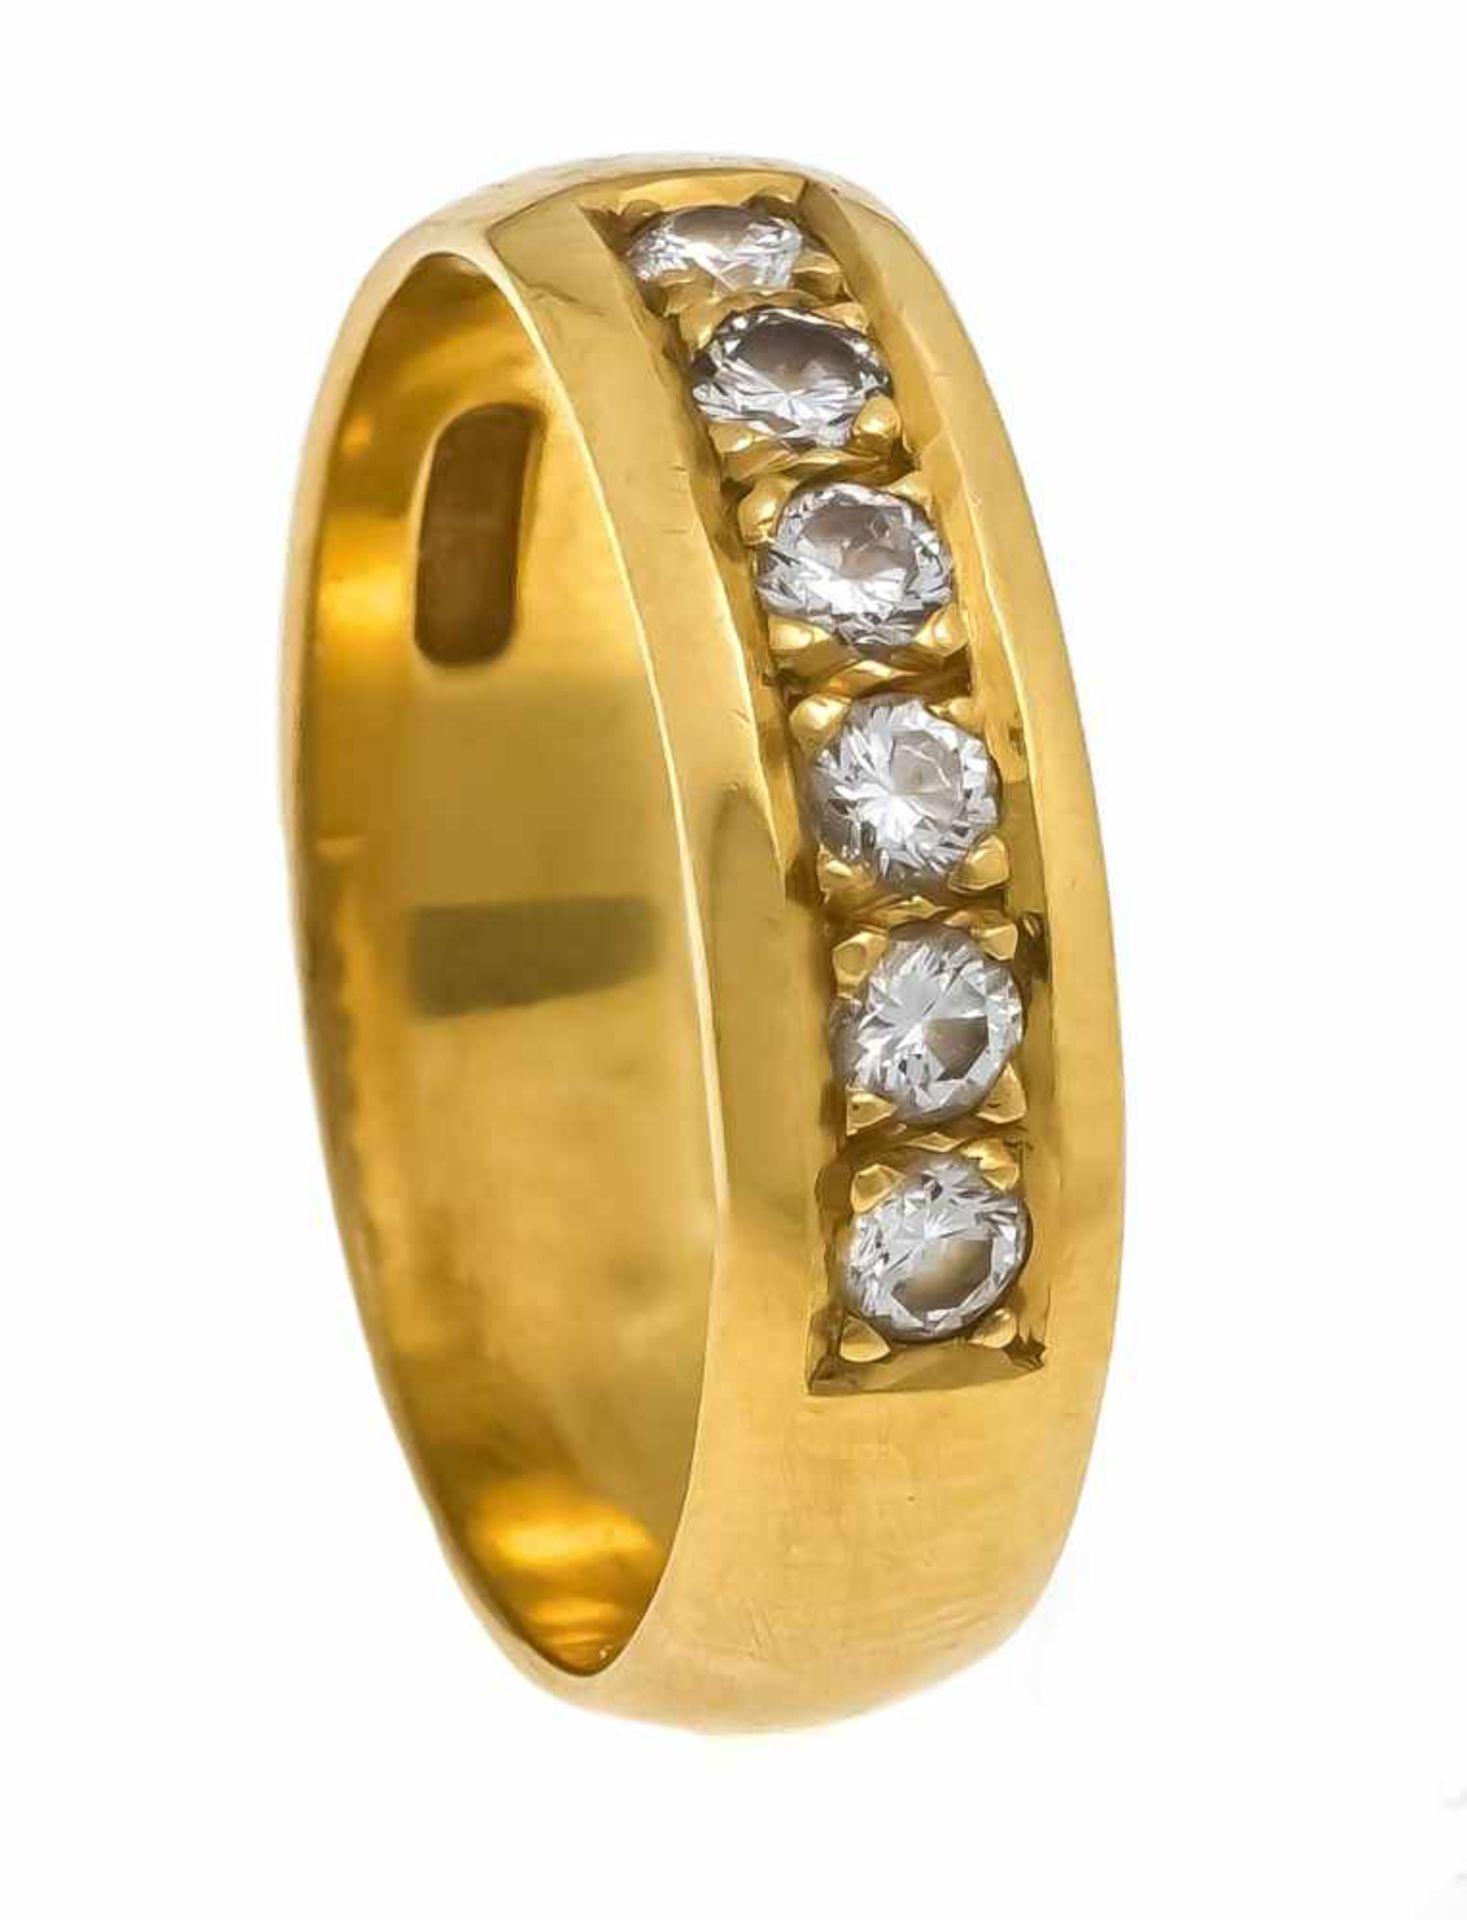 Brillant-Ring GG 900/000 mit 6 Brillanten, zus. 0,30 ct TW-W/VVS-VS, RG 57, 6,2 gDiamond ring GG